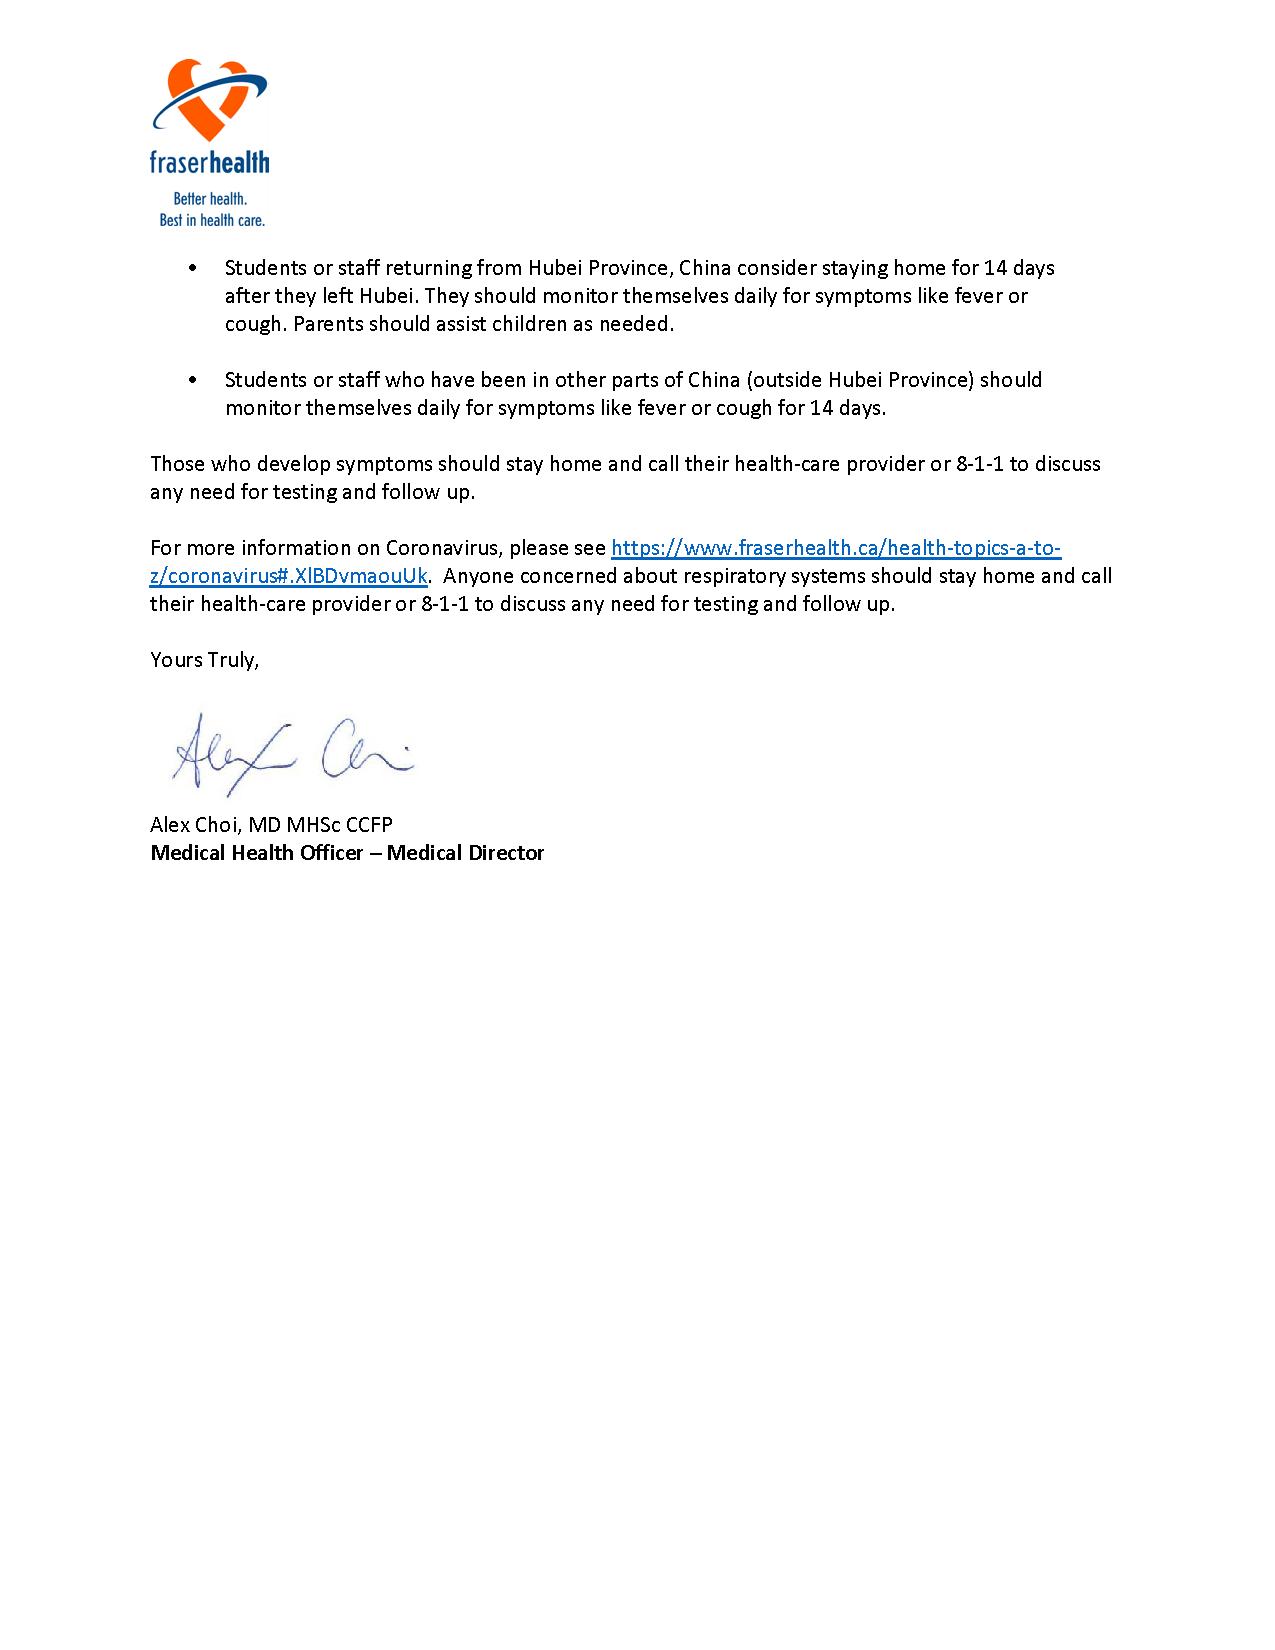 Novel Coronavirus Update - F. East_21Feb2020_Page_2.png